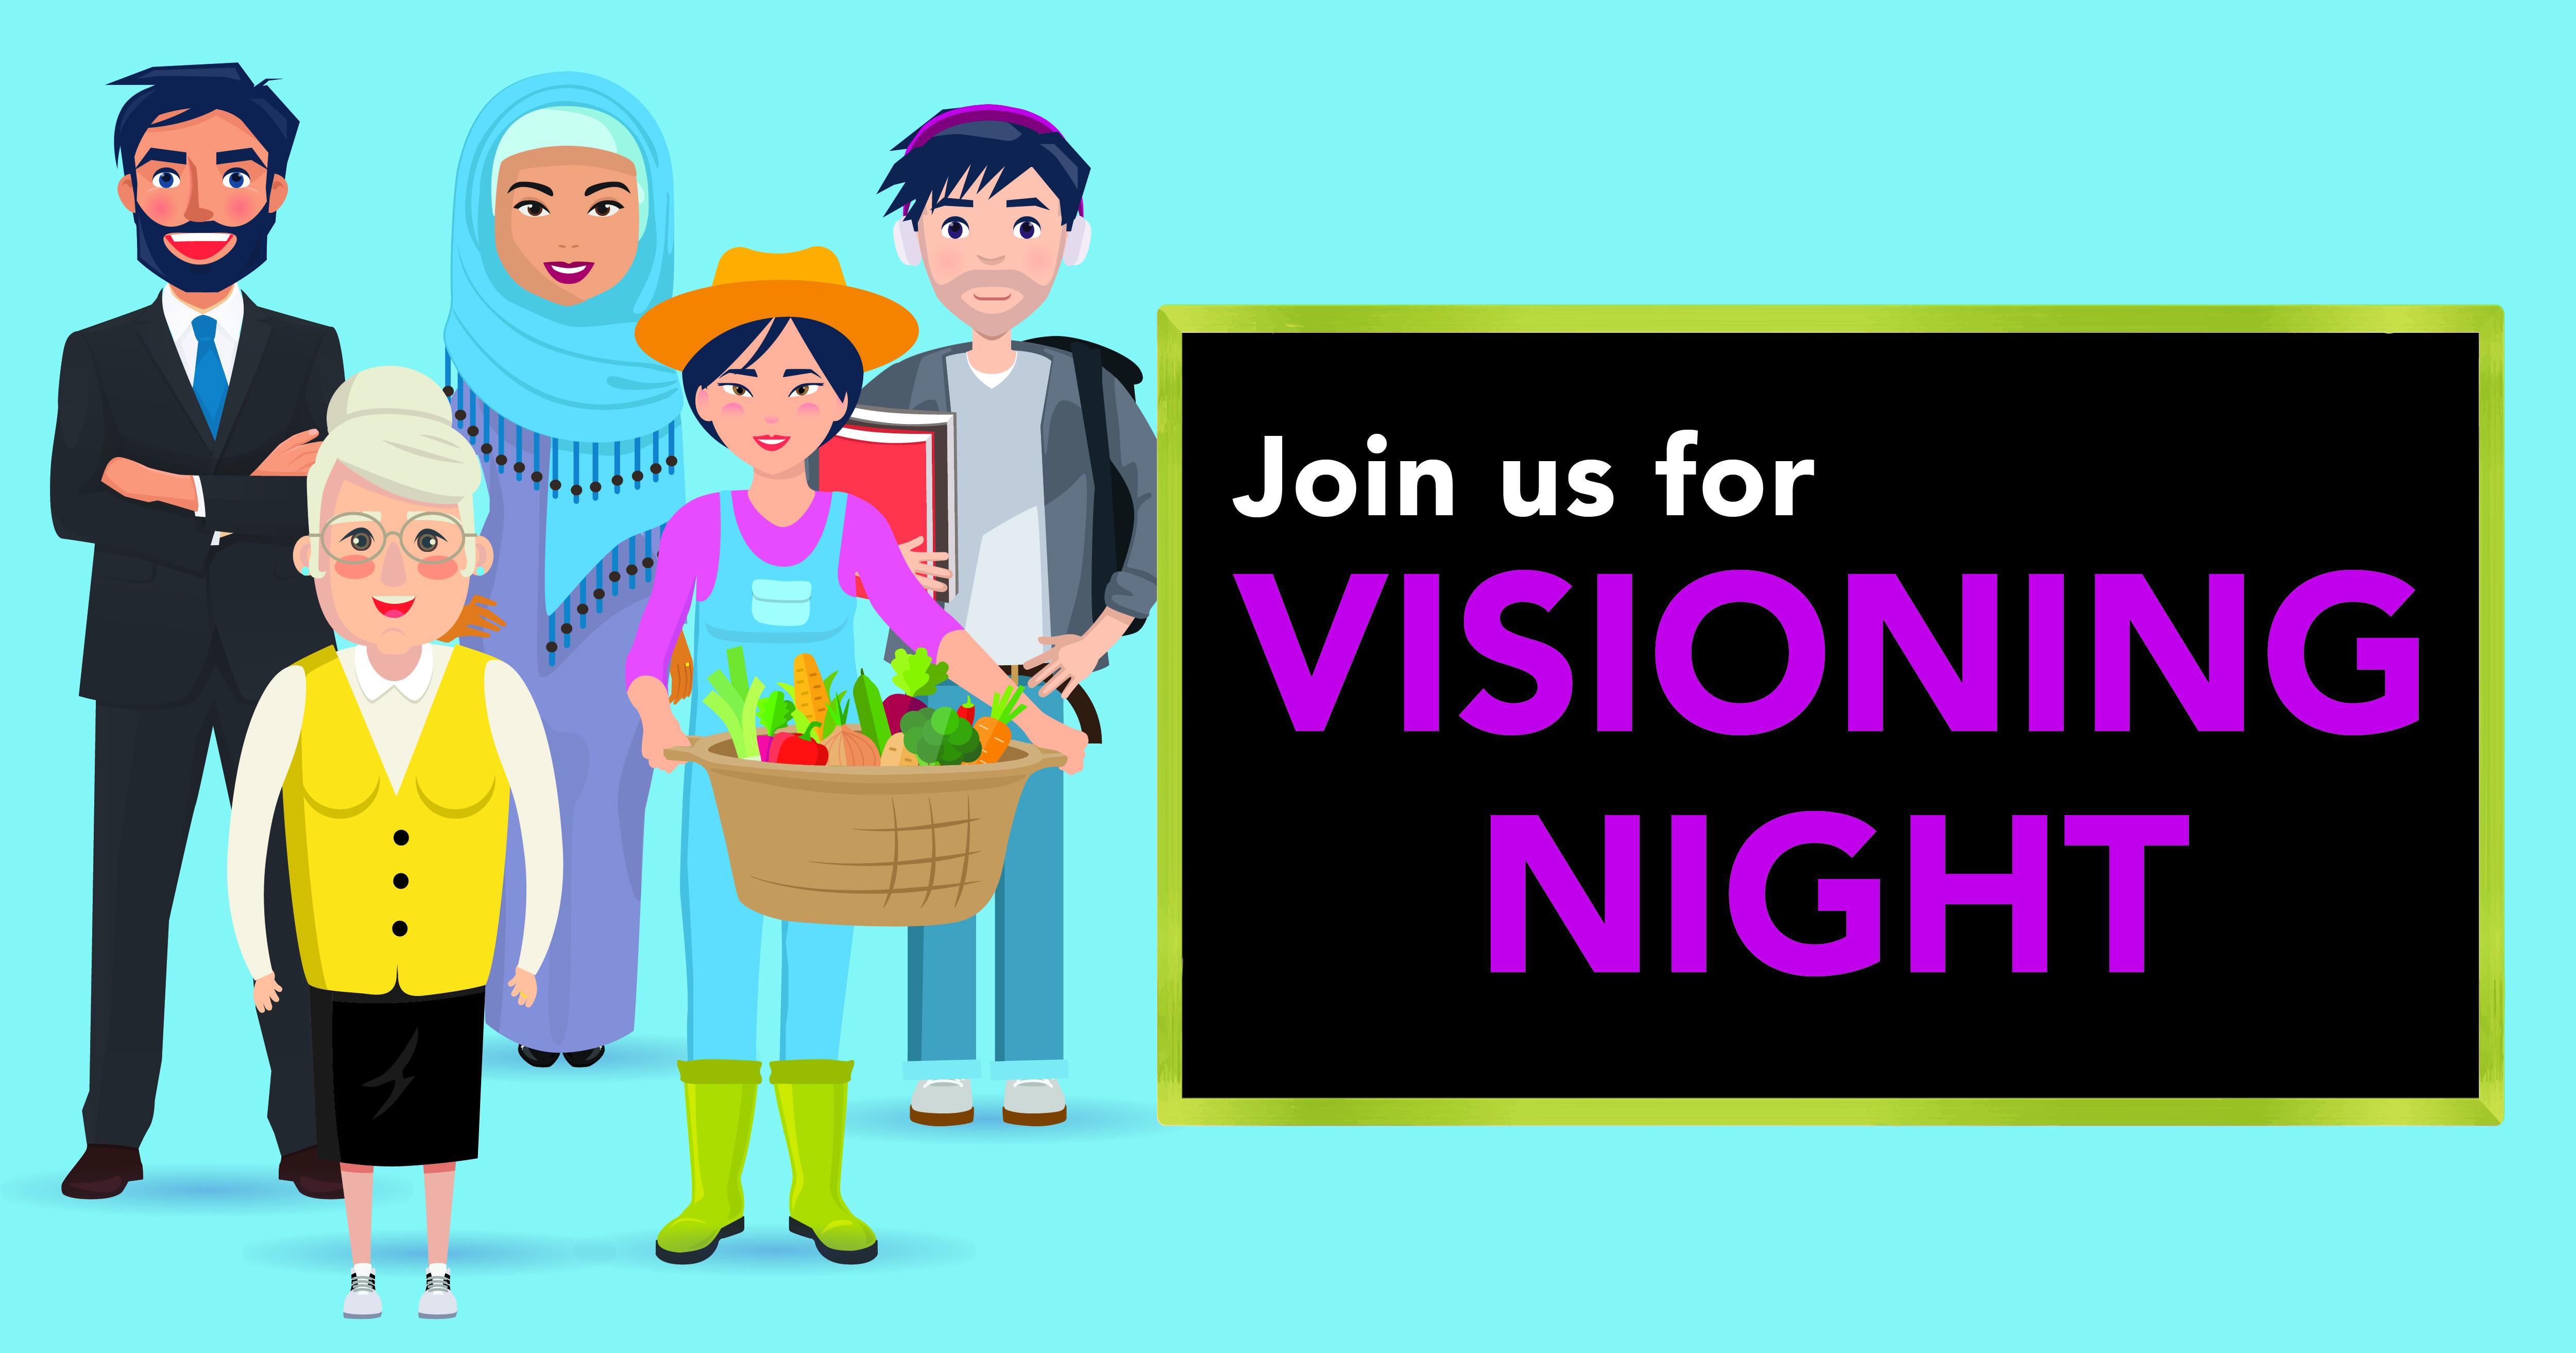 Invitation to Visioning Night